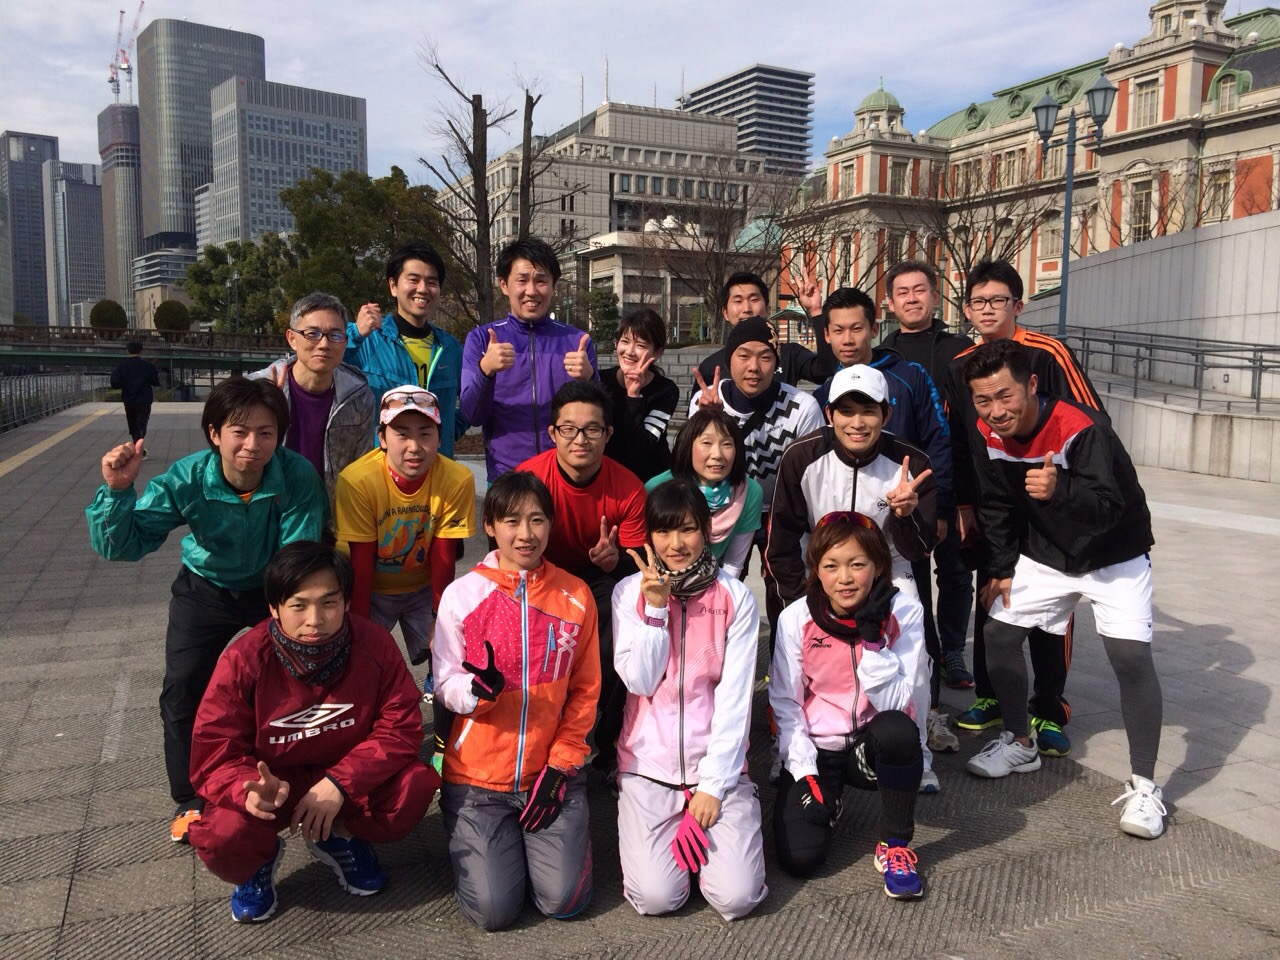 10k(ランクラOB堀岡さん、吉川、会津)